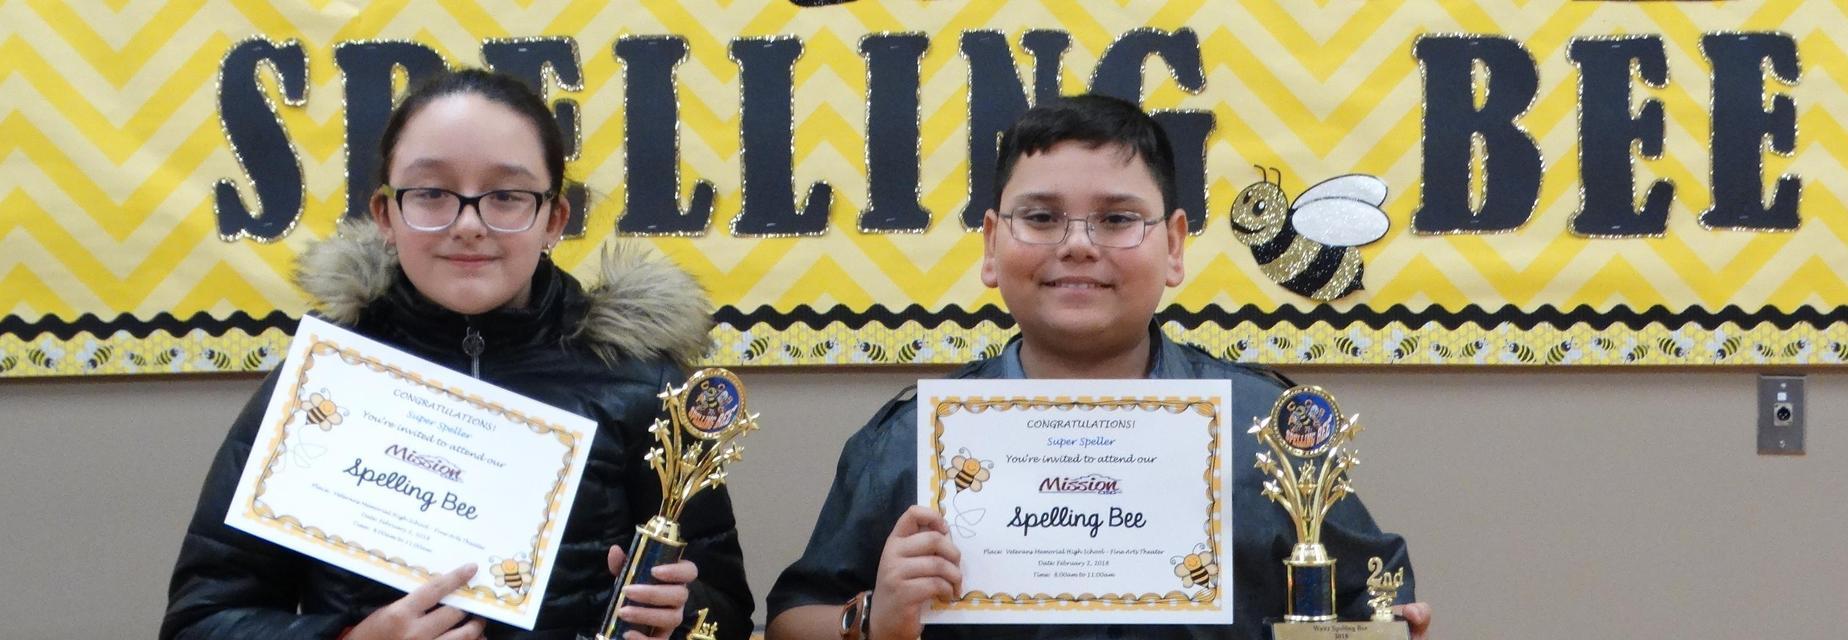 Waitz Spelling Bee winners